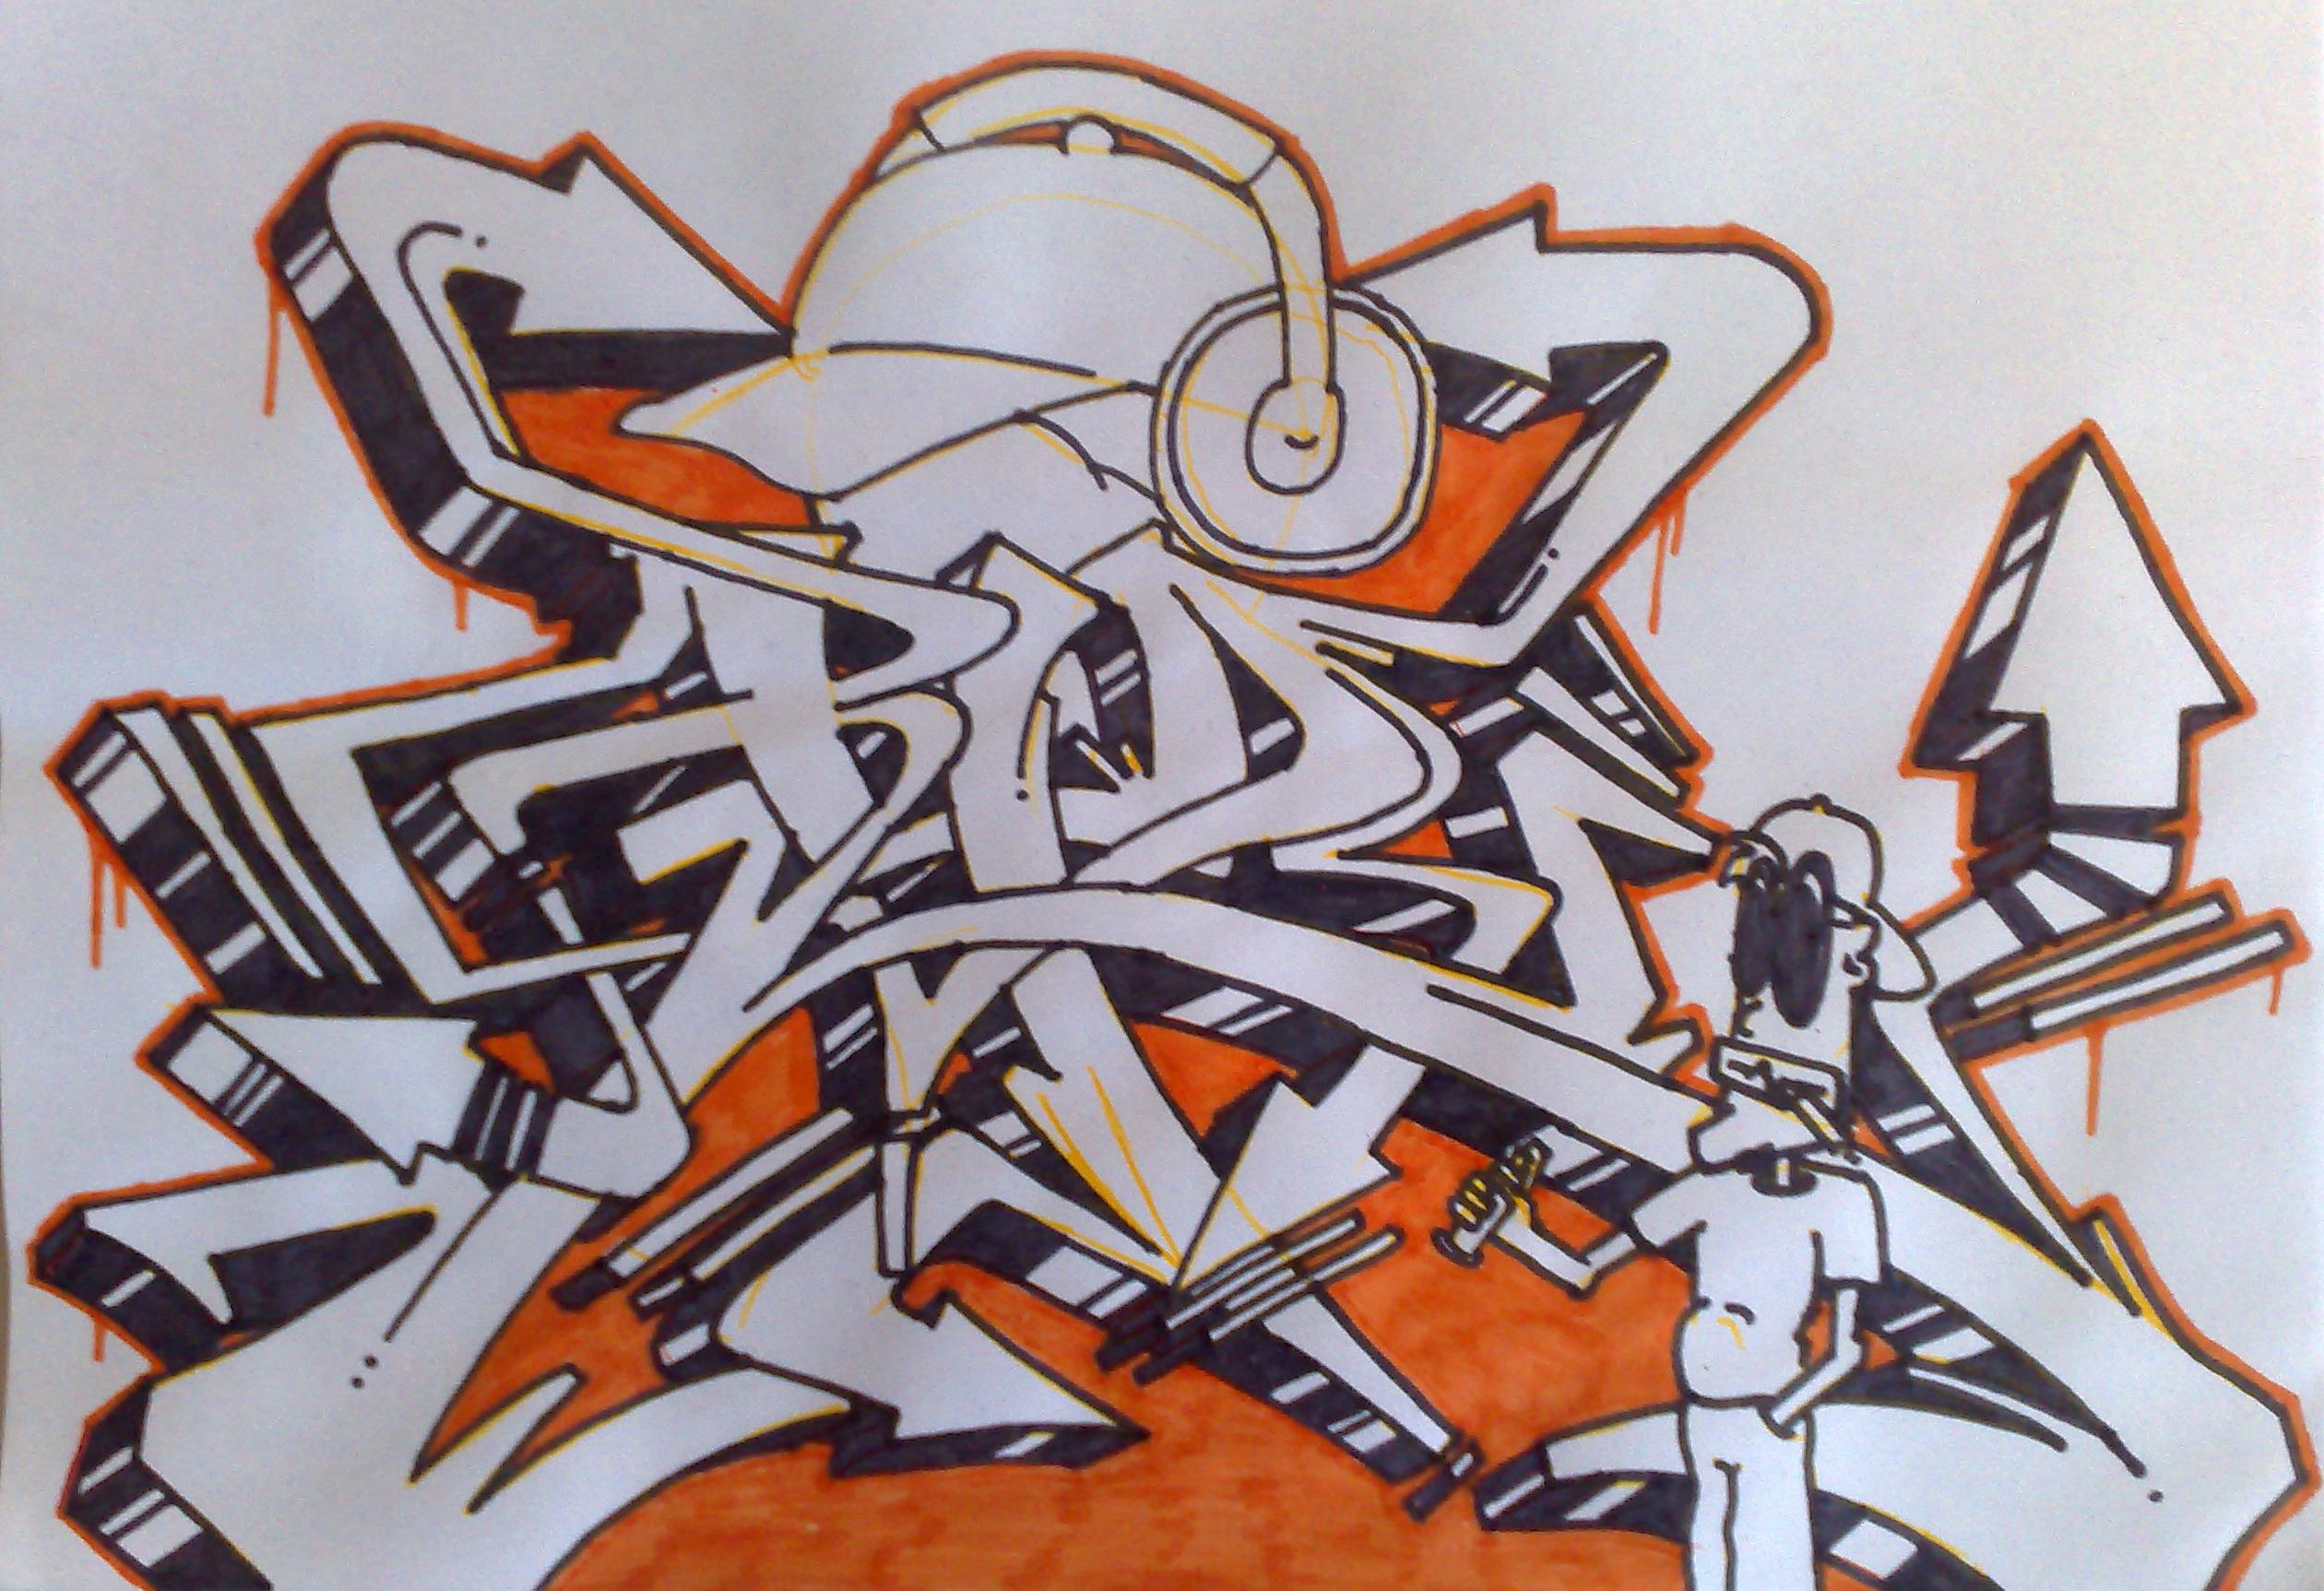 Bid 1 Wildstyle By DontGiveABiip